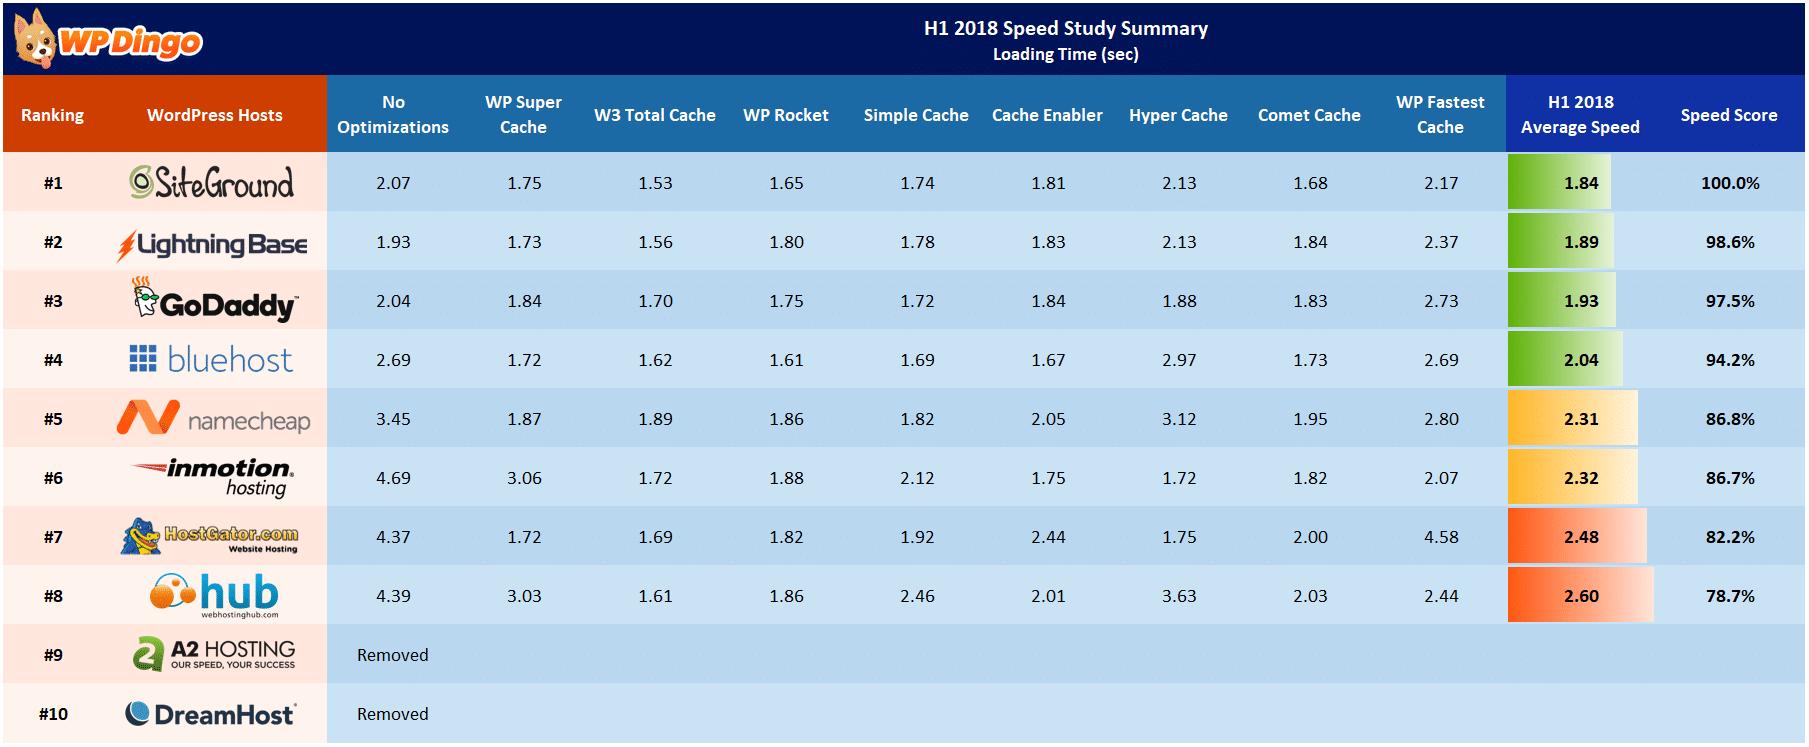 H1 2018 Speed Study Summary Table - All Hosts